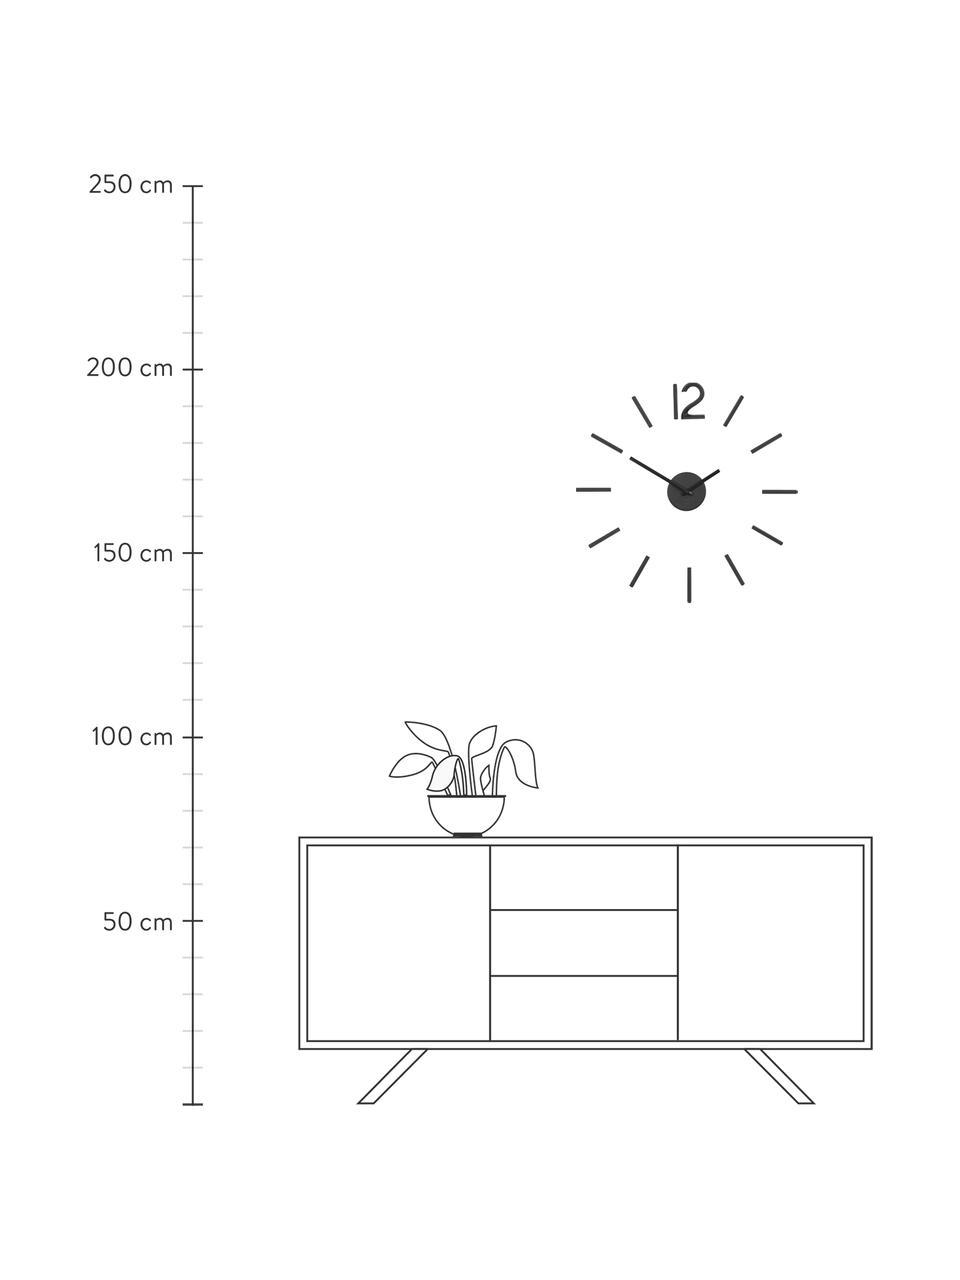 Wanduhr-Bausatz Blink, Aluminium, lackiert, Schwarz, Ø 60 cm